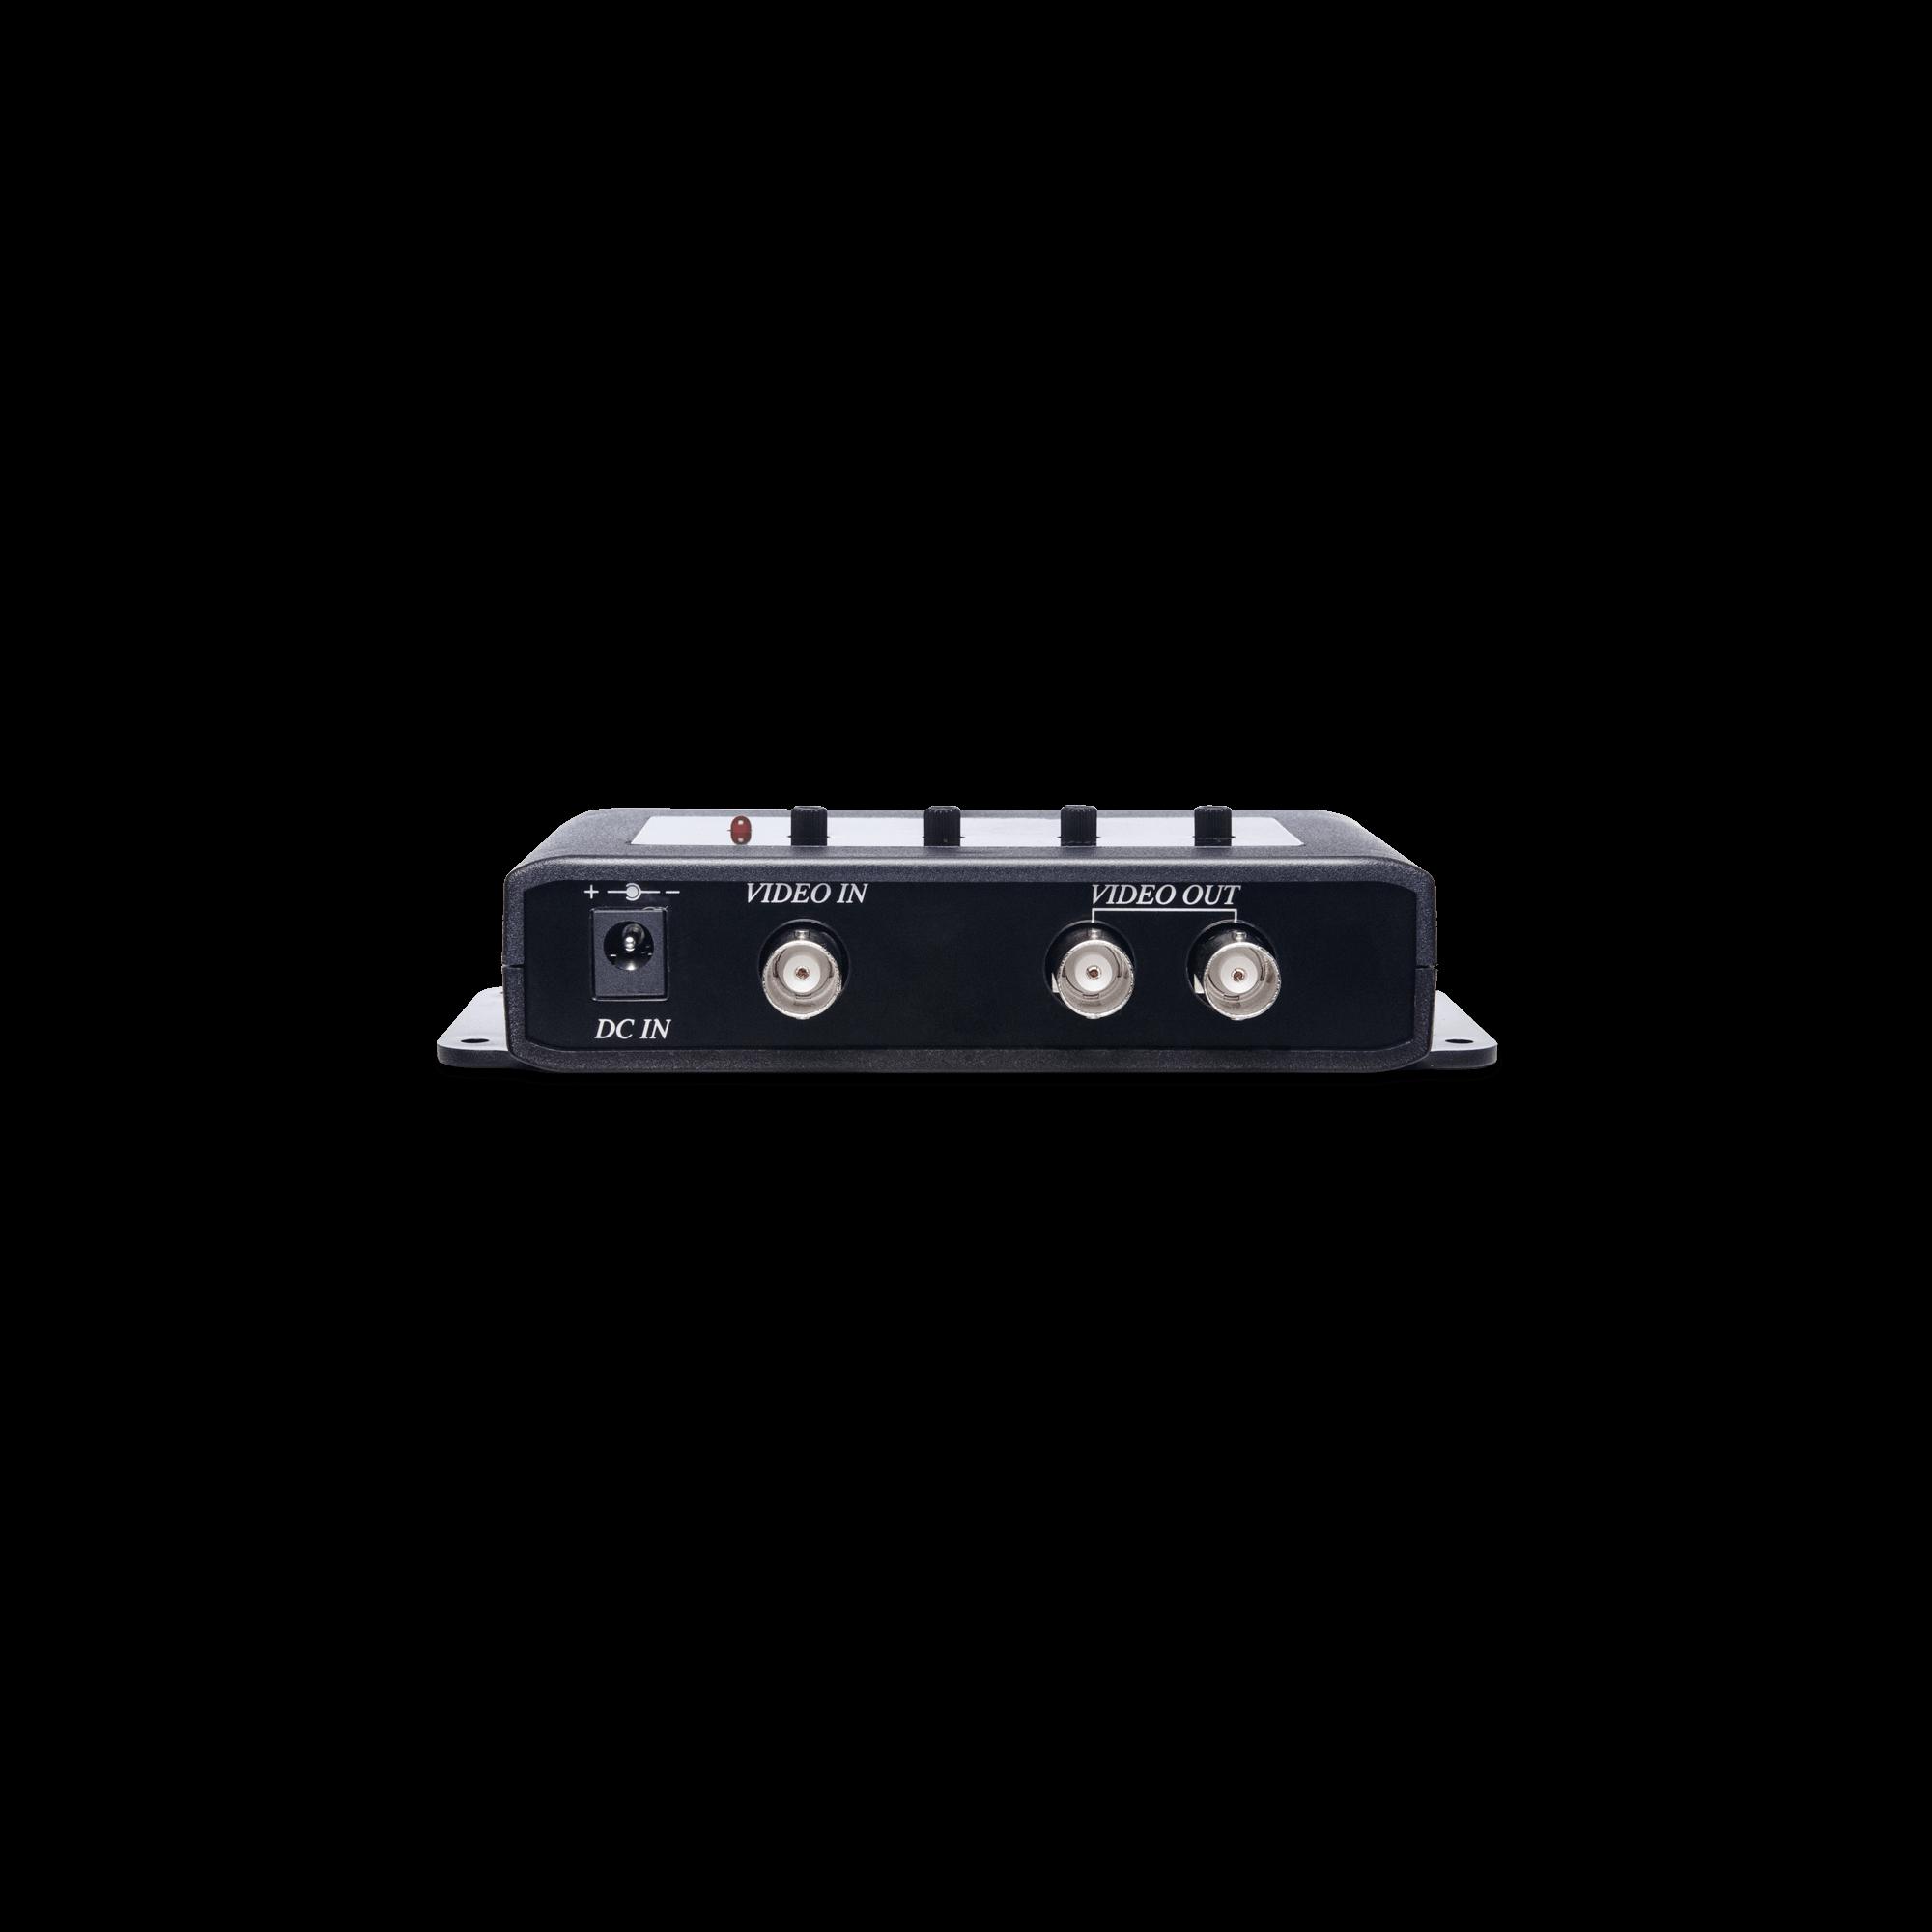 1 x 2 CVBS Video Distribution Amplifier